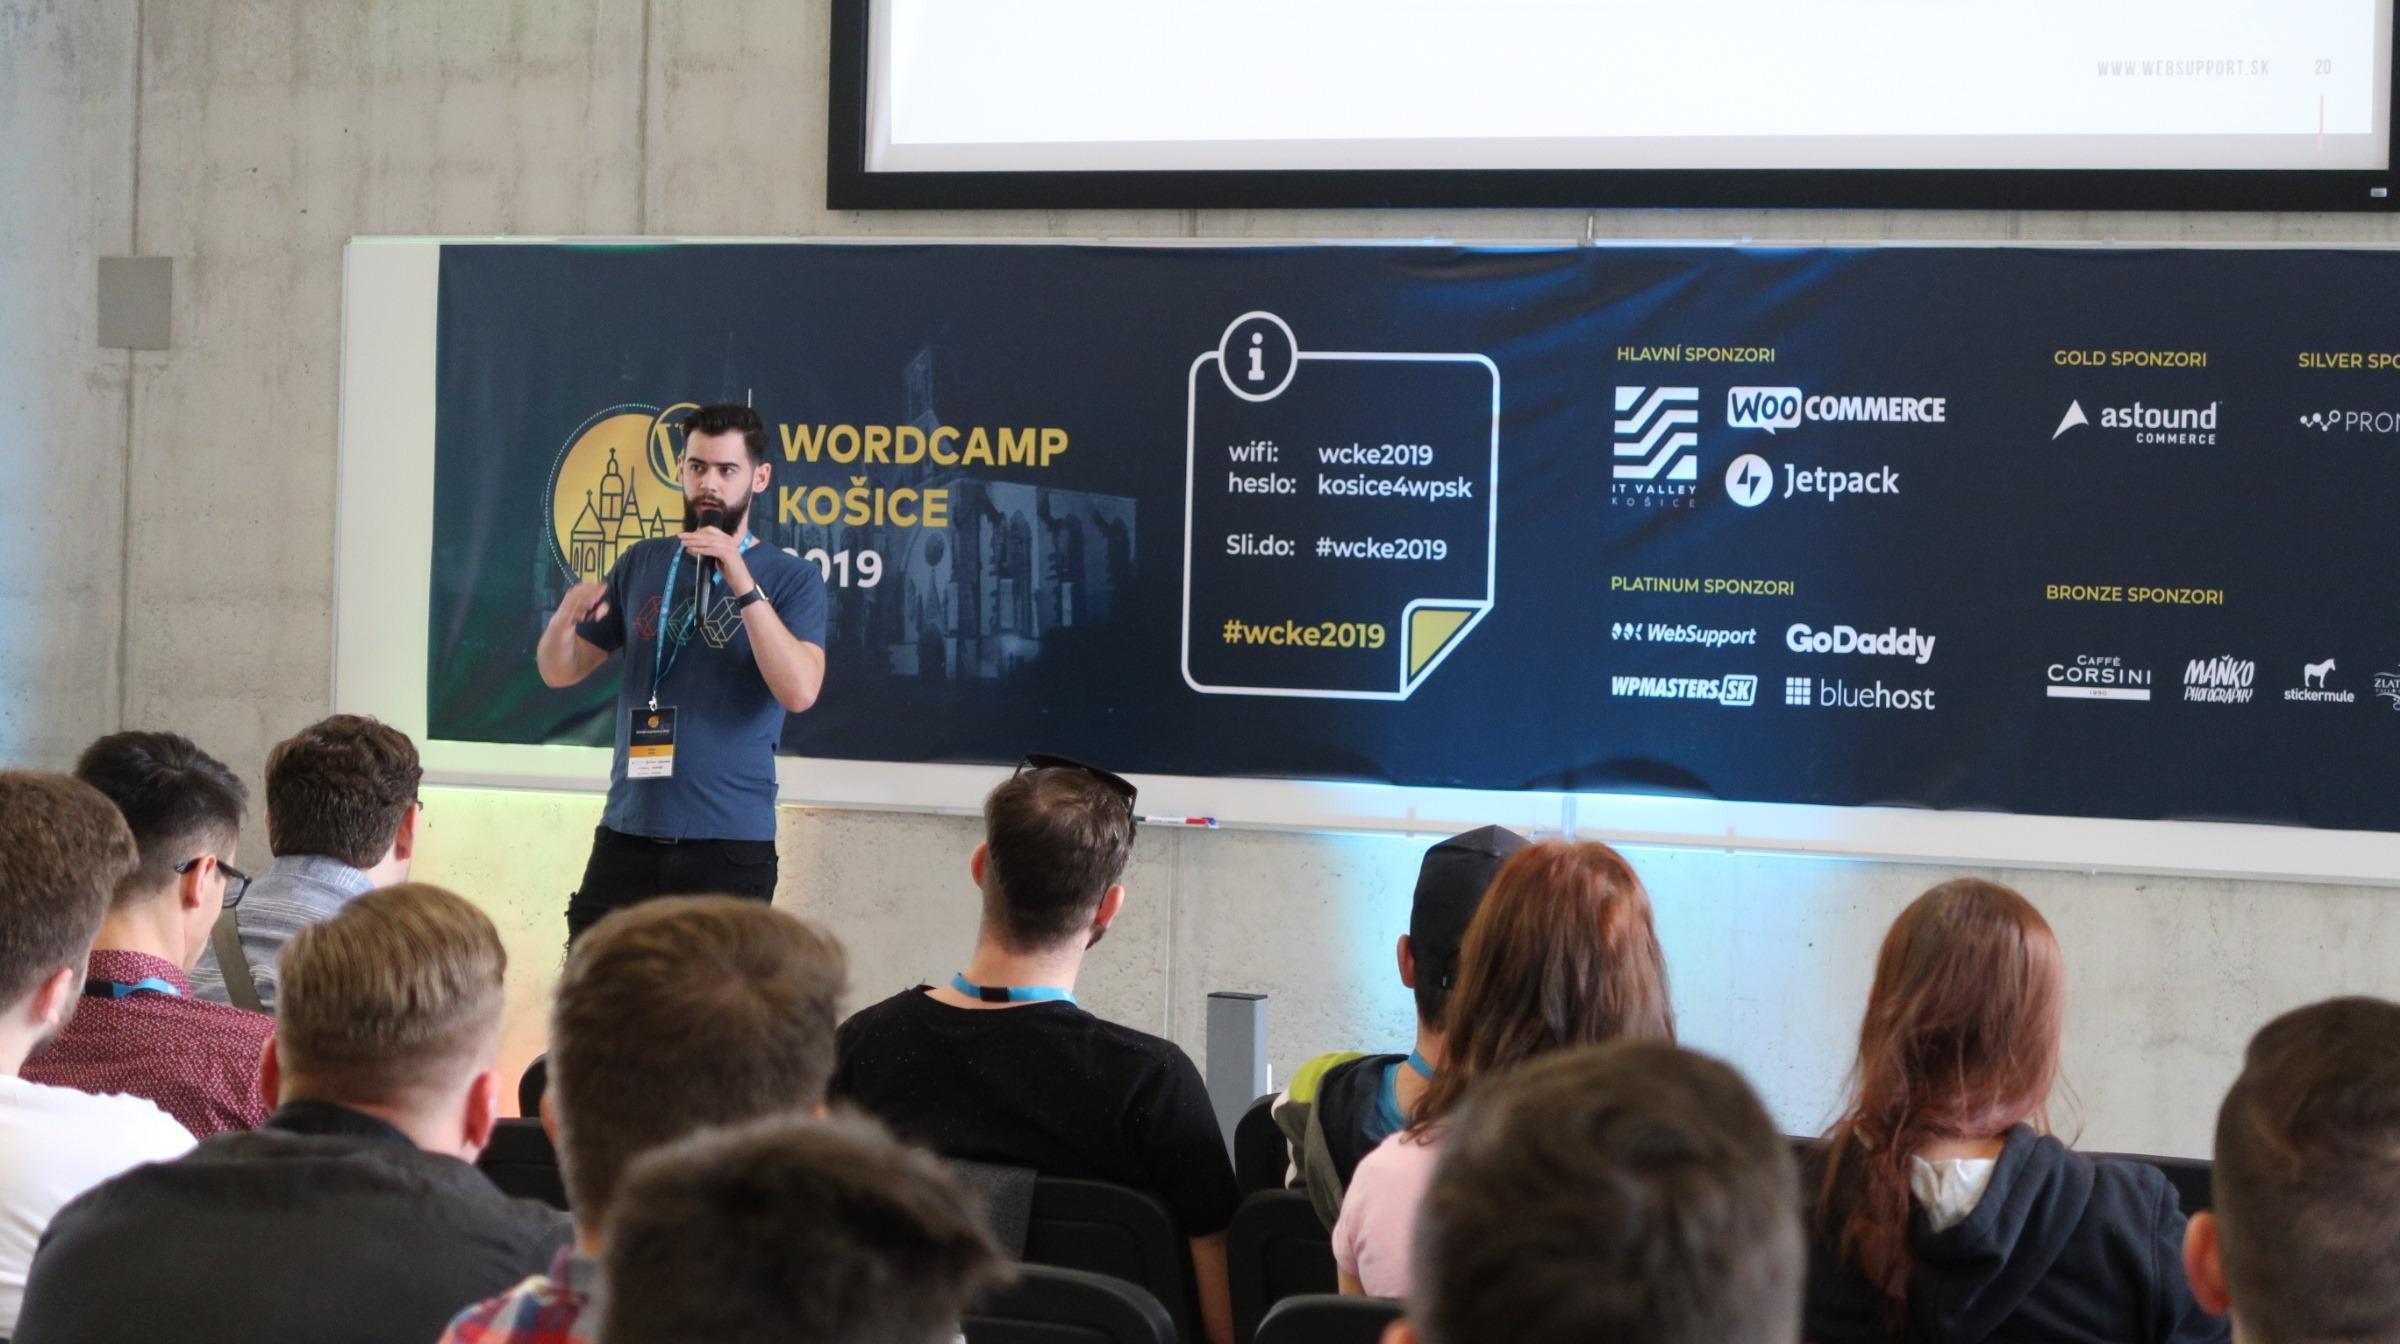 Wordcamp wordpress